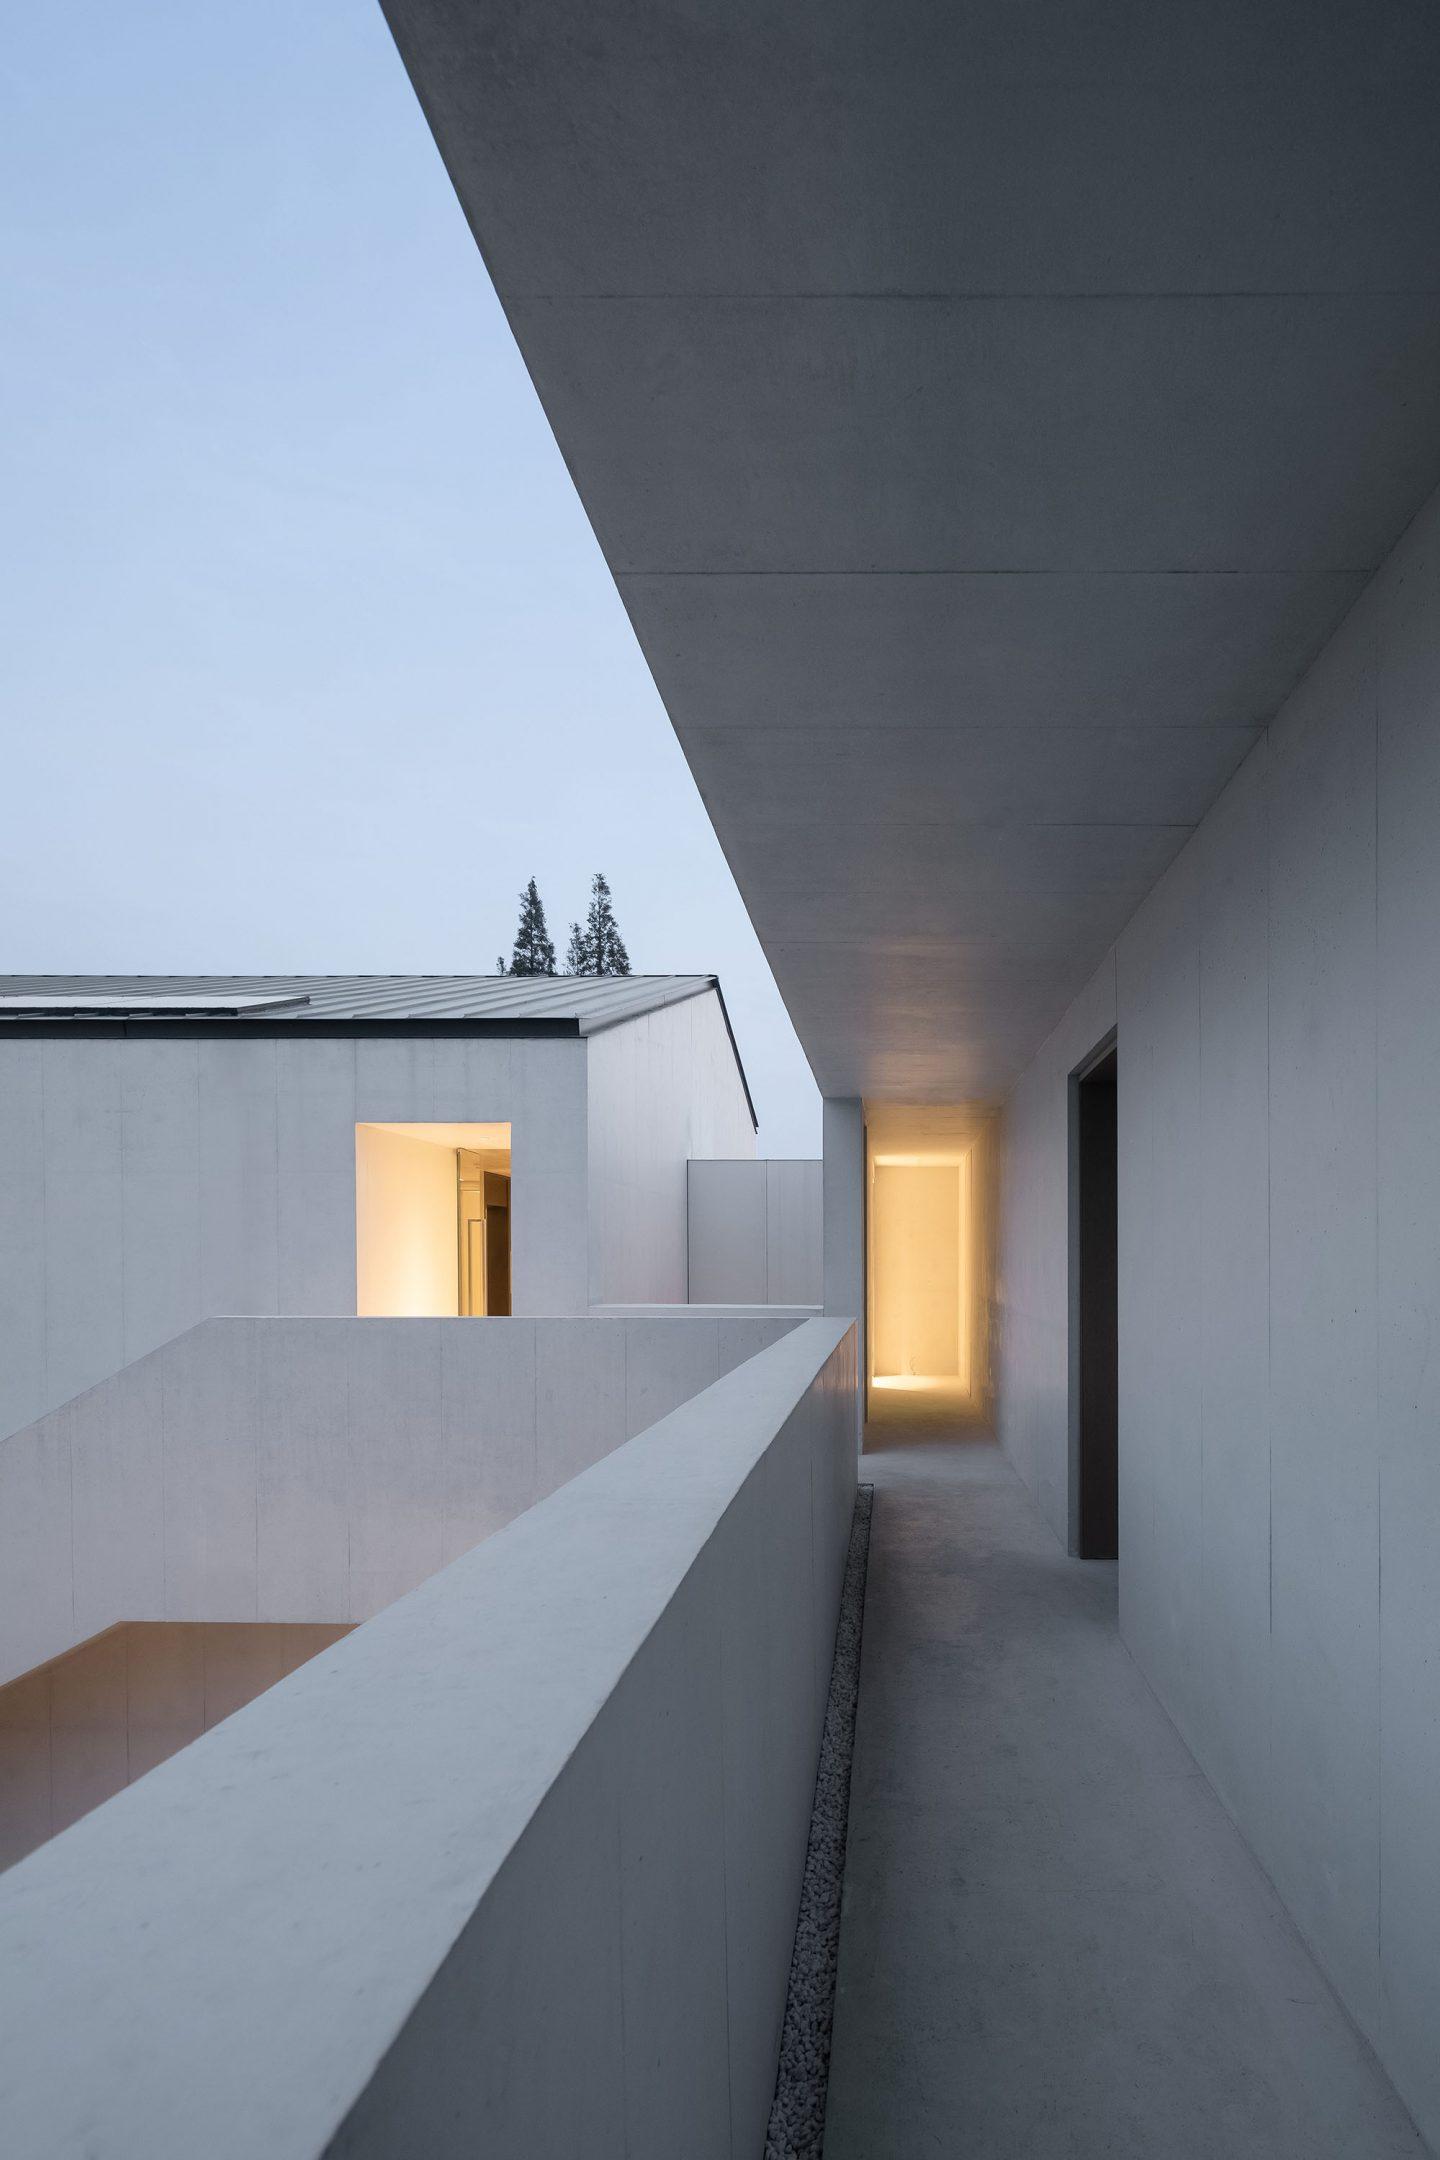 IGNANT-Architecture-HorizontalDesign-ZhangYanCulturalMuseum-11